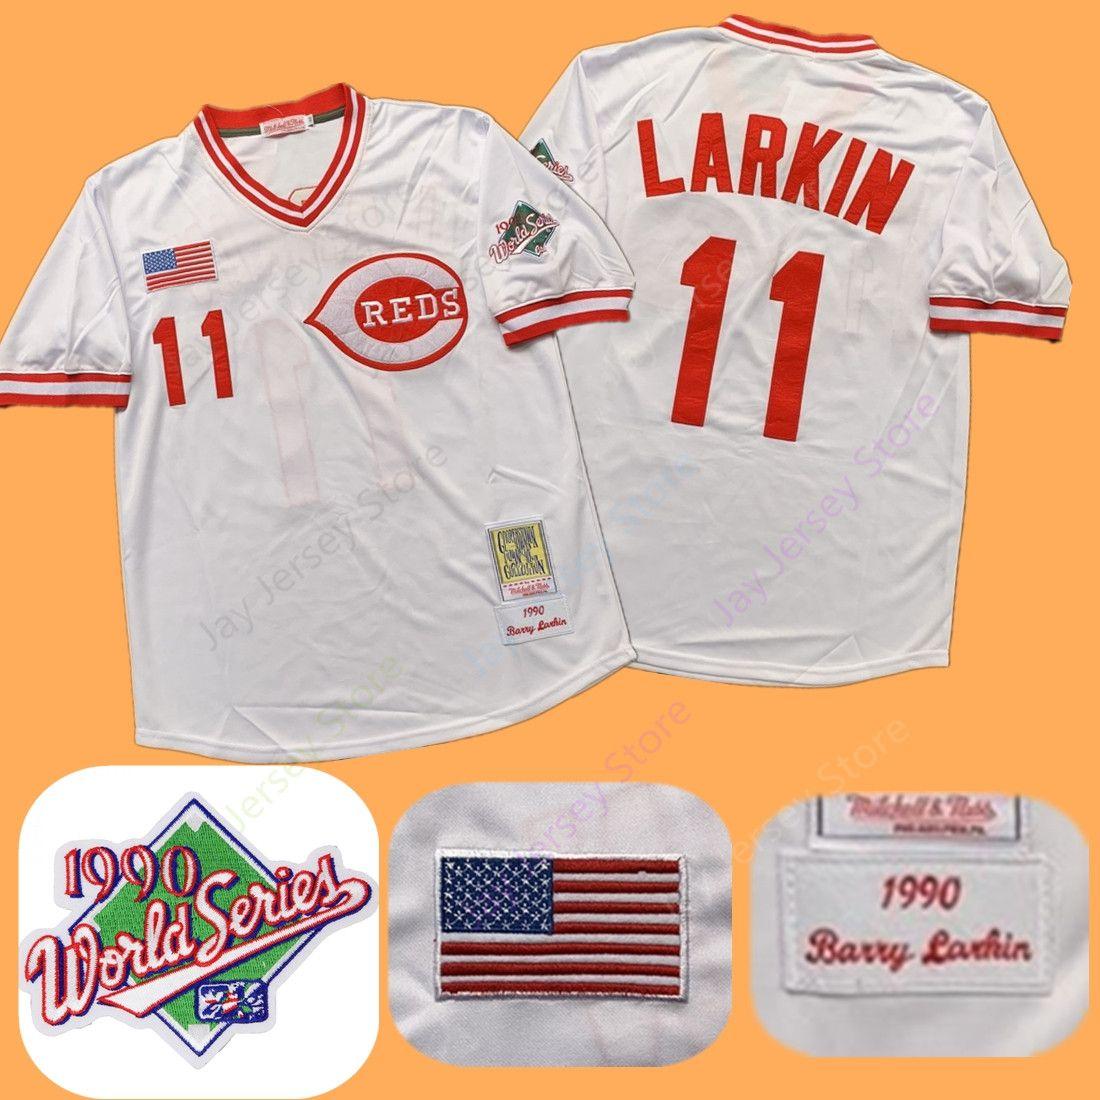 size 40 87633 9919d Barry Larkin Jersey 1990 Reds WS World Series Patch Cooperstown Cincinnati  Grey White Red Mesh BP Throwback Stitched Flexbase Men Size M-3XL